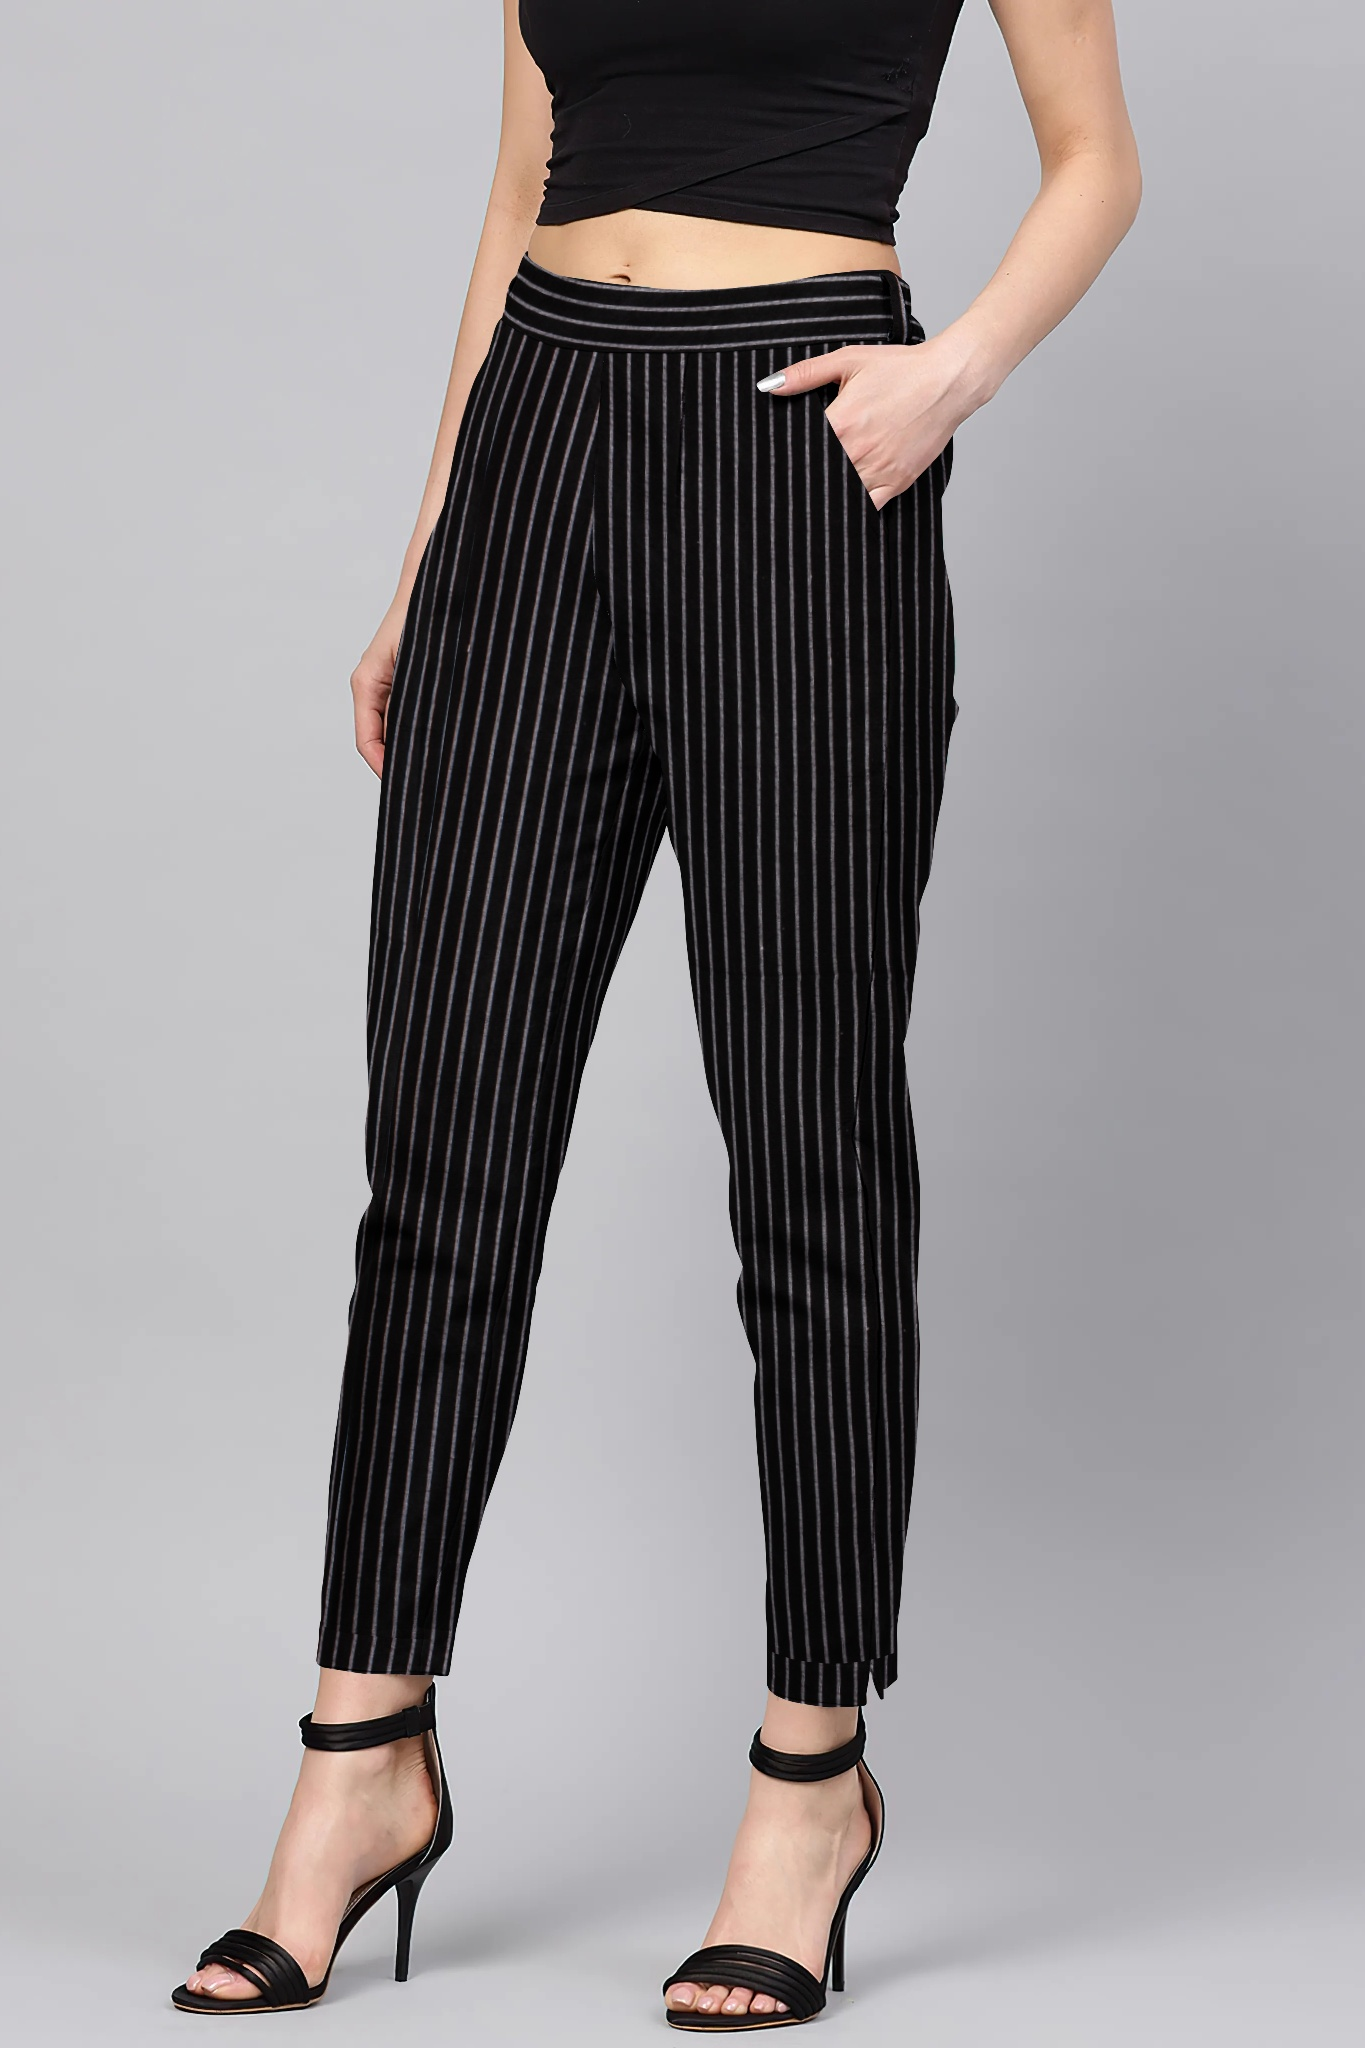 /home/customer/www/fabartcraft.com/public_html/uploadshttps://www.shopolics.com/uploads/images/medium/Black-White-Cotton-Stripe-Regular-Fit-Solid-Trouser-36111.jpg